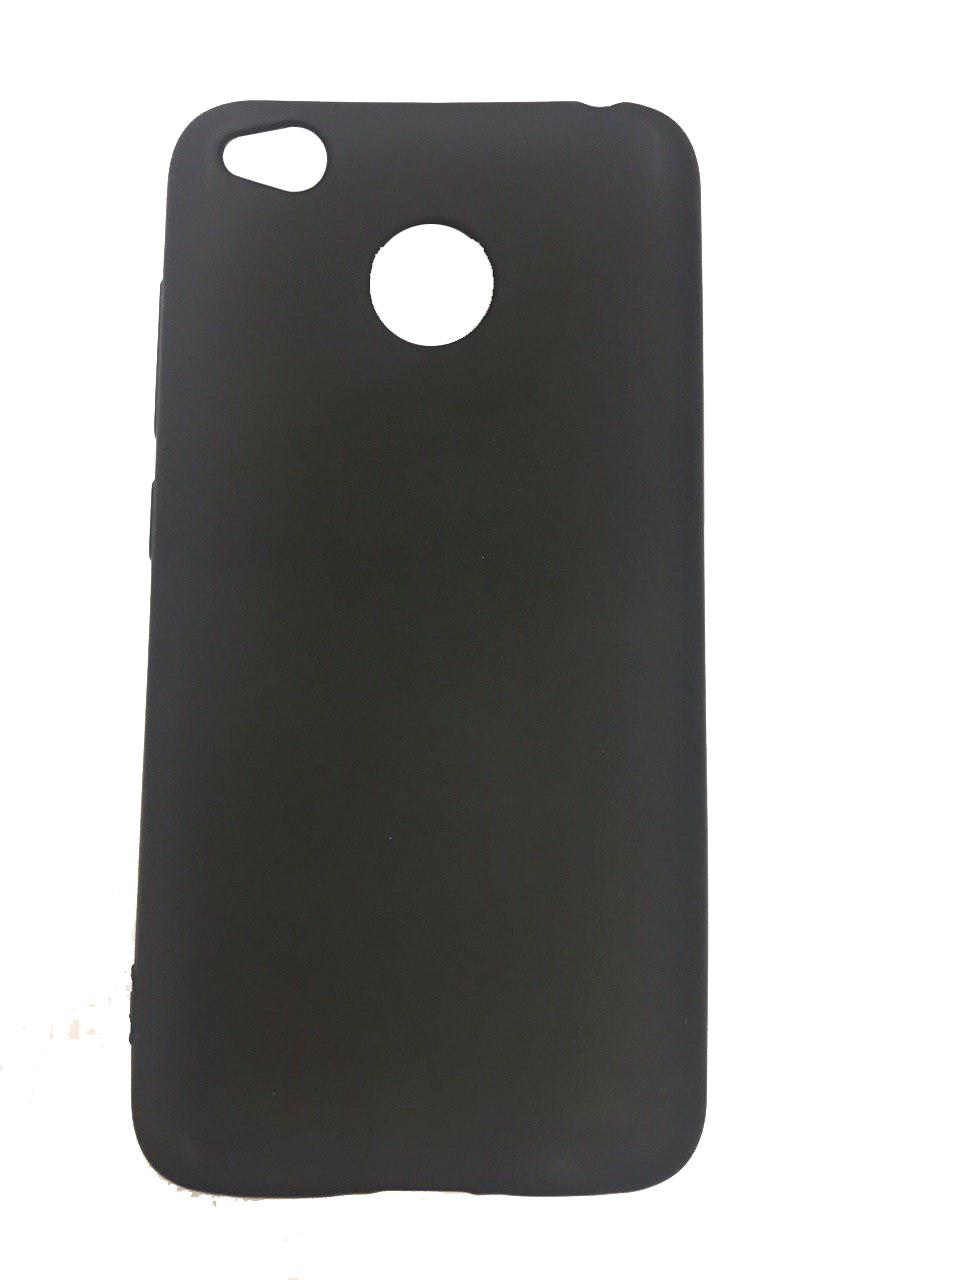 Чехол для Xiaomi Redmi Note 4X Чехол для Xiaomi Redmi Note 4x (Черный) аксессуар чехол книга для xiaomi redmi note 4x innovation book pink gold 10576